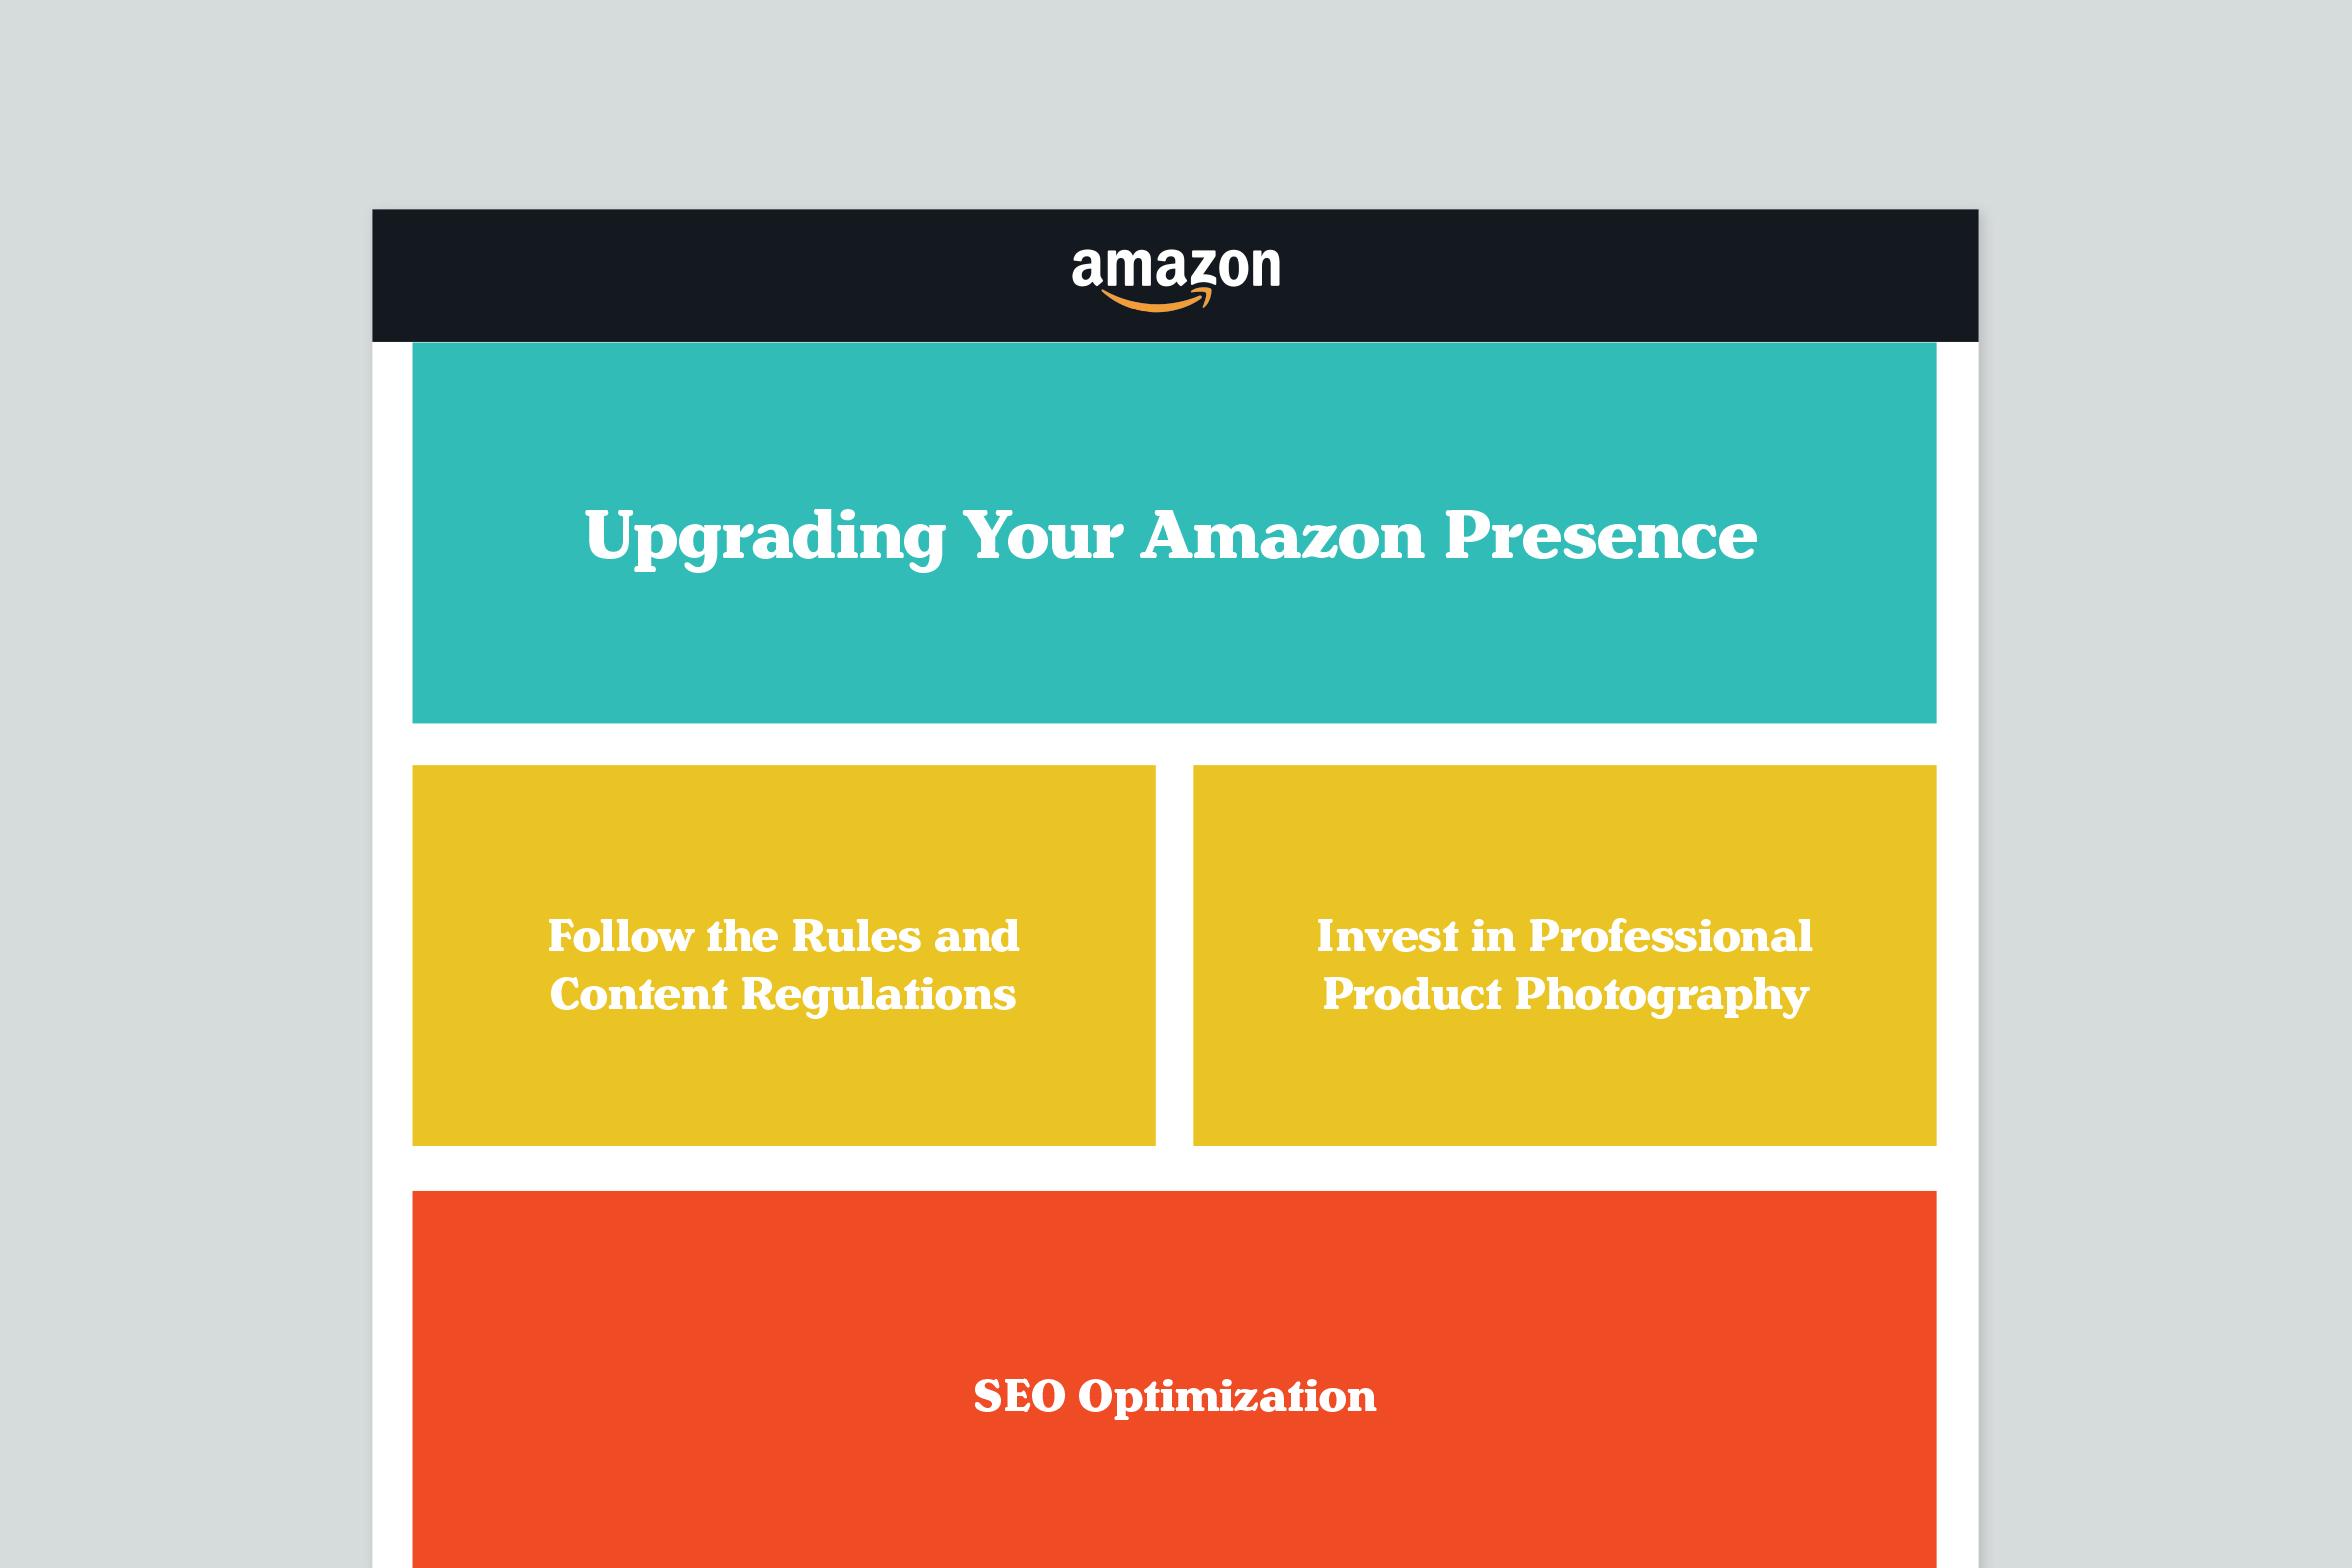 upgrading your Amazon presence